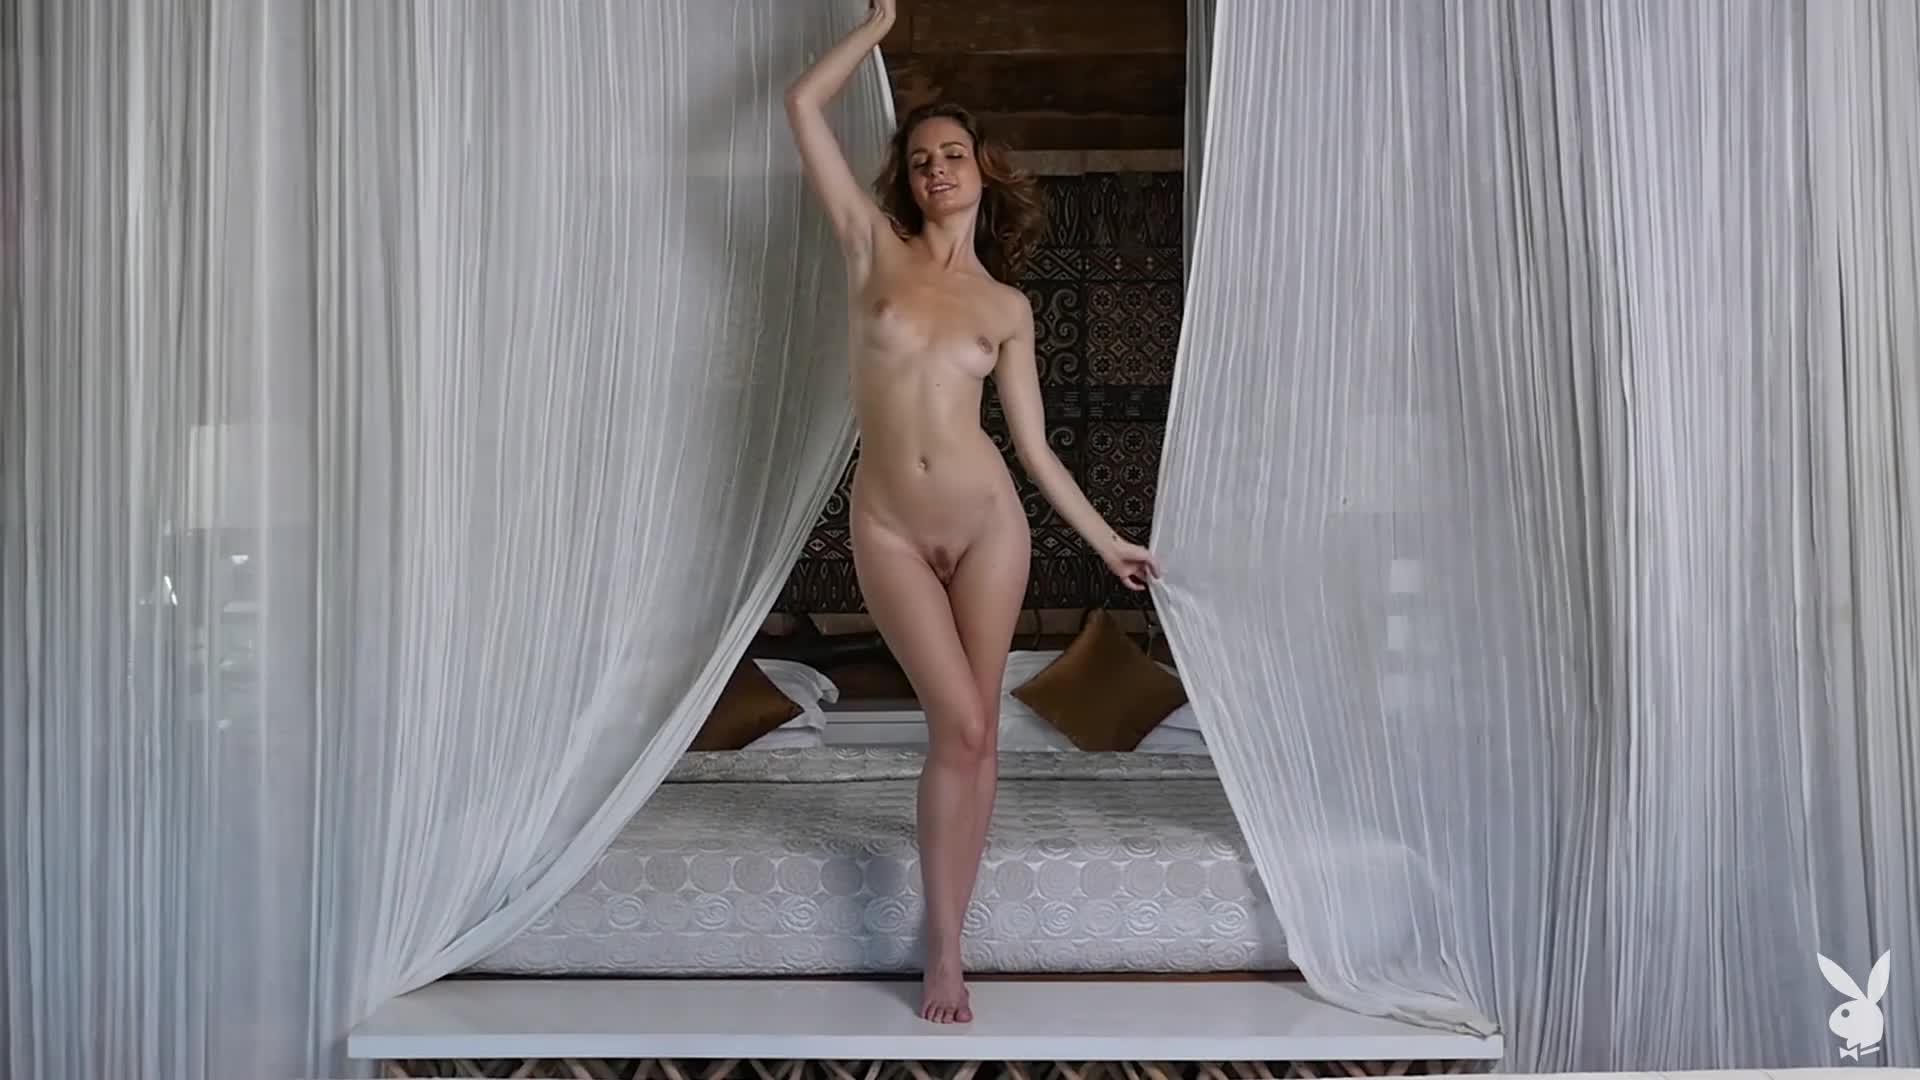 Evelyn Sommer - Bedroom Eyes - Playboy Plus - k2s.tv